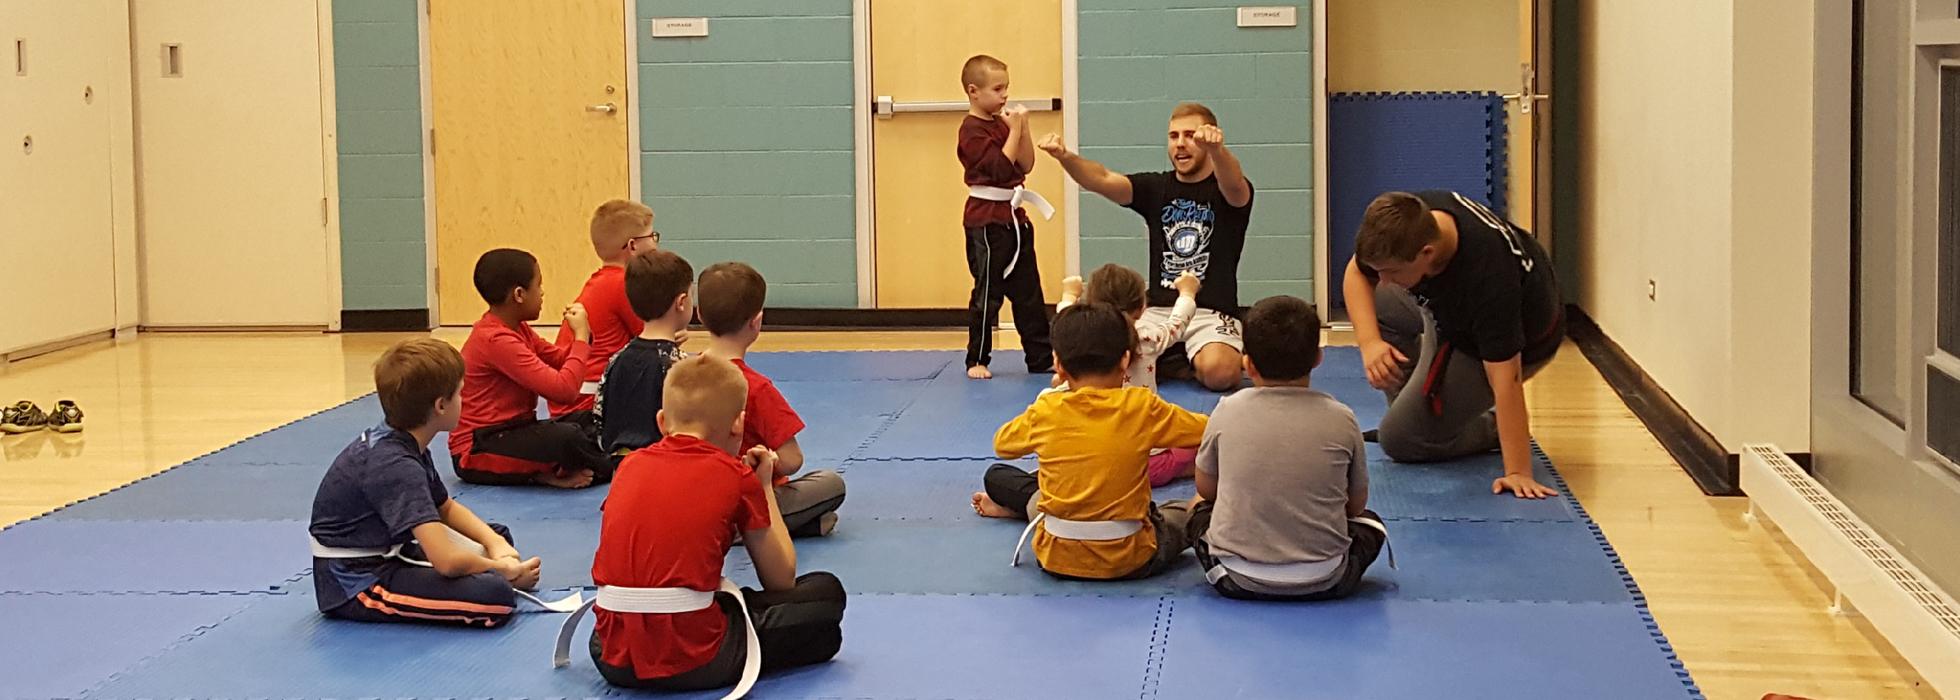 Mixed Martial Arts in Lockport IL, Kids Karate in Lockport IL, Taekwondo in Lockport IL, Jiu-Jitsu in Lockport IL